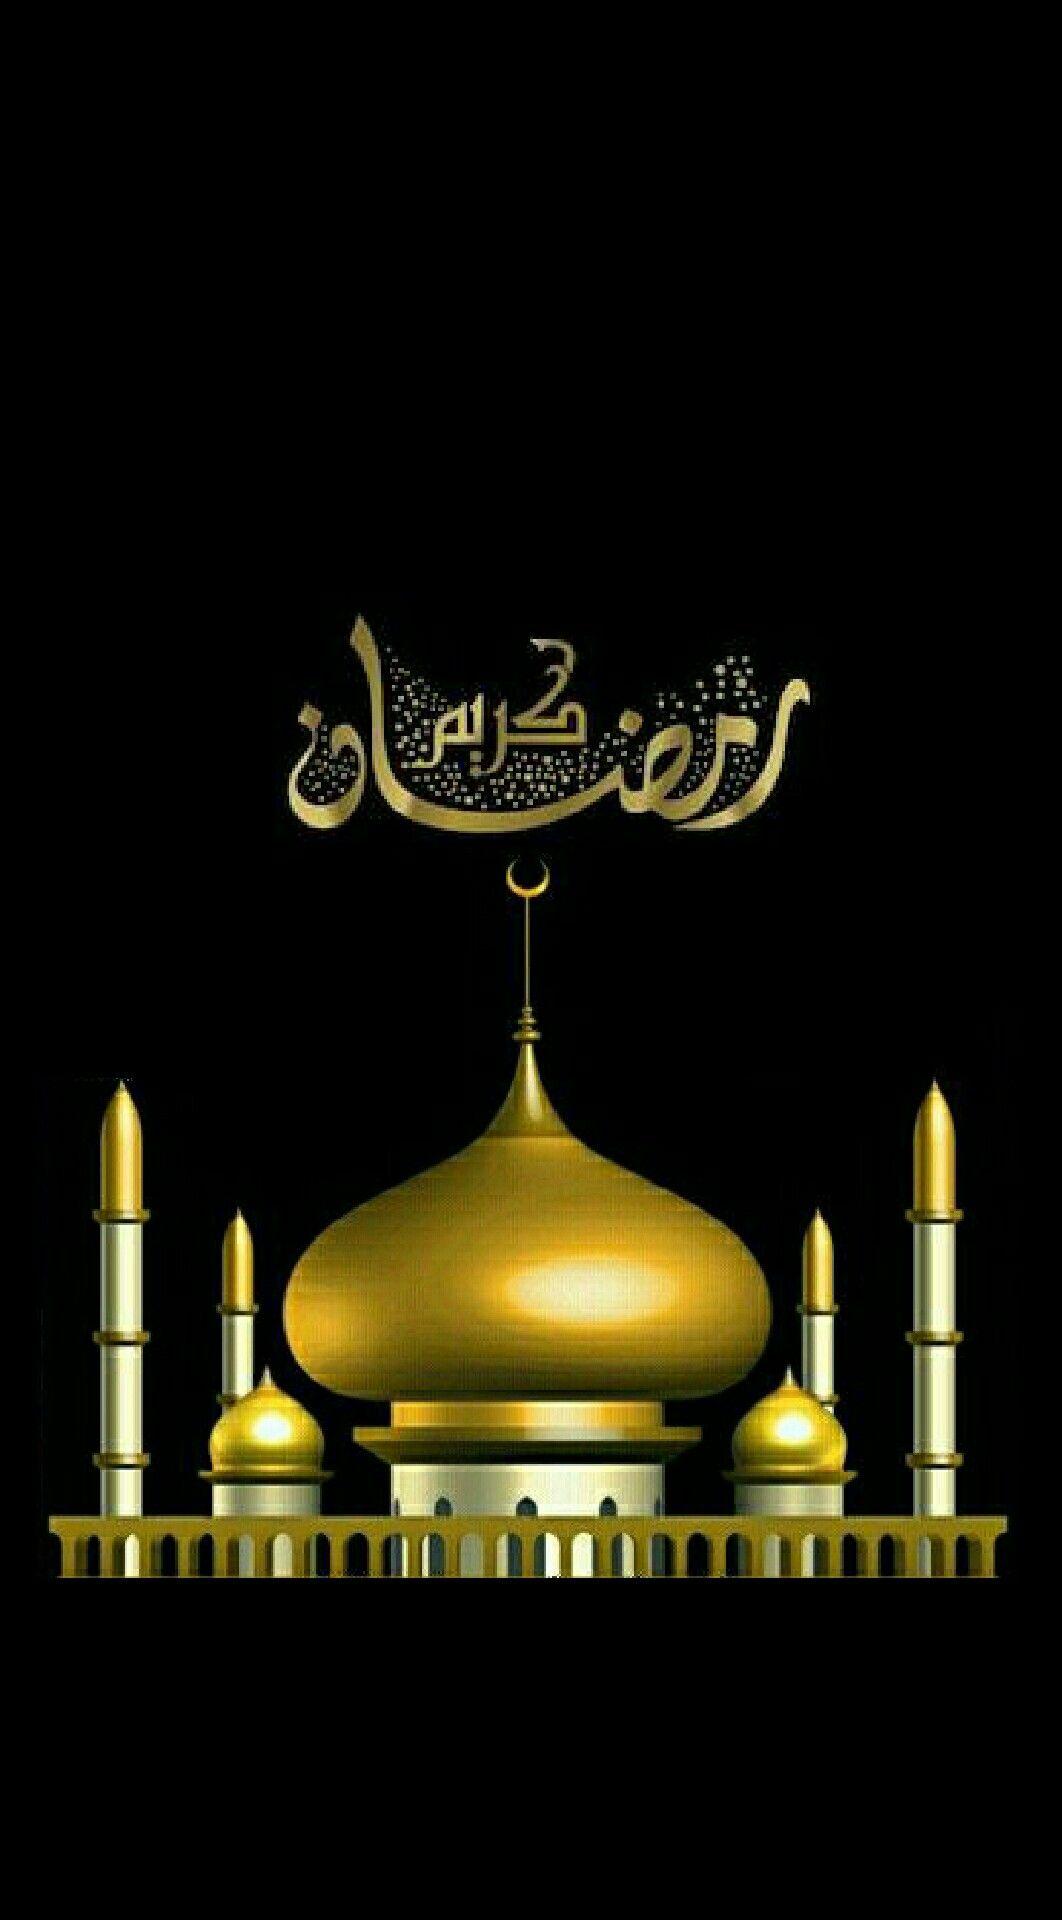 كل عام و انتم بألف خير Ramadan Kareem Pictures Photoshop Backgrounds Ramadan Kareem